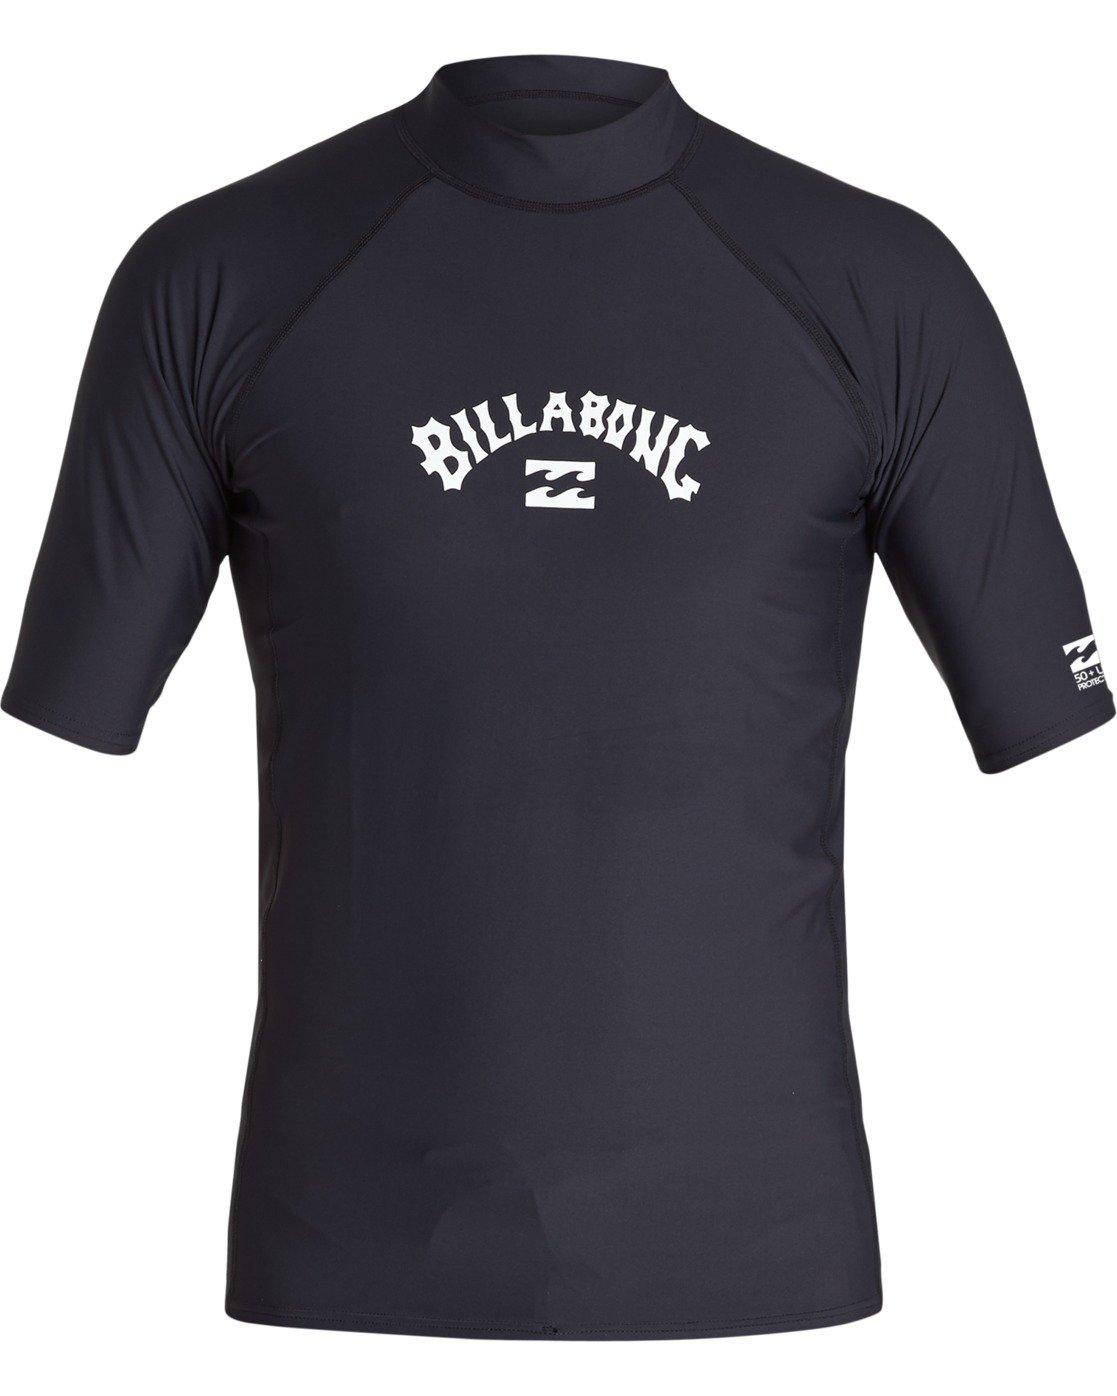 Billabong Mens Union Performance Fit Short Sleeve Rashguard